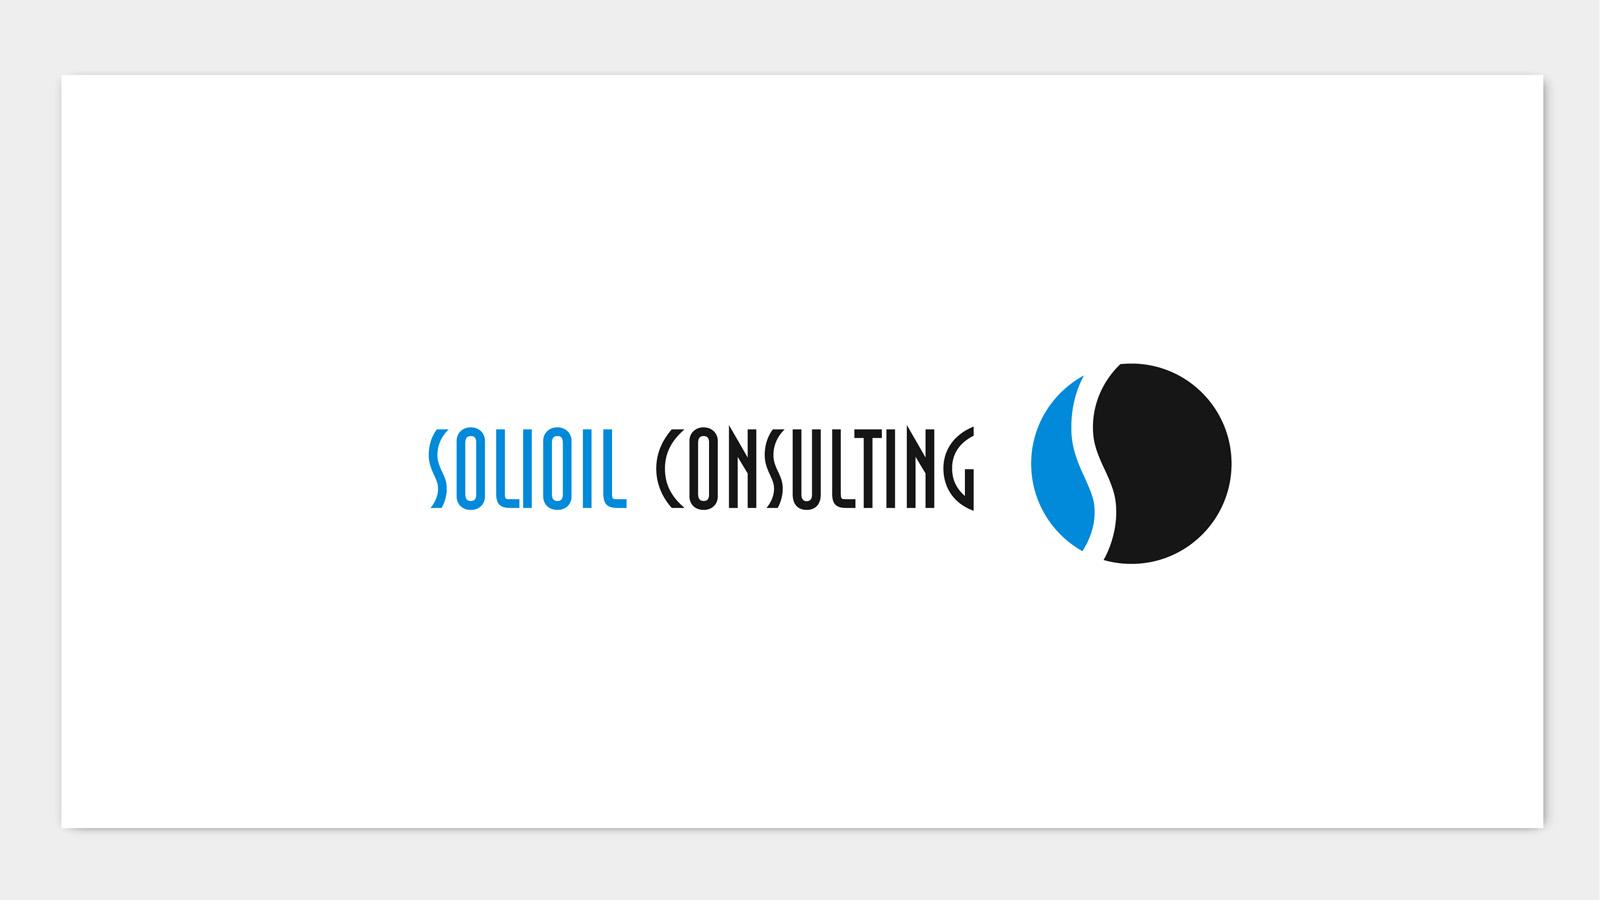 Solioil Consulting